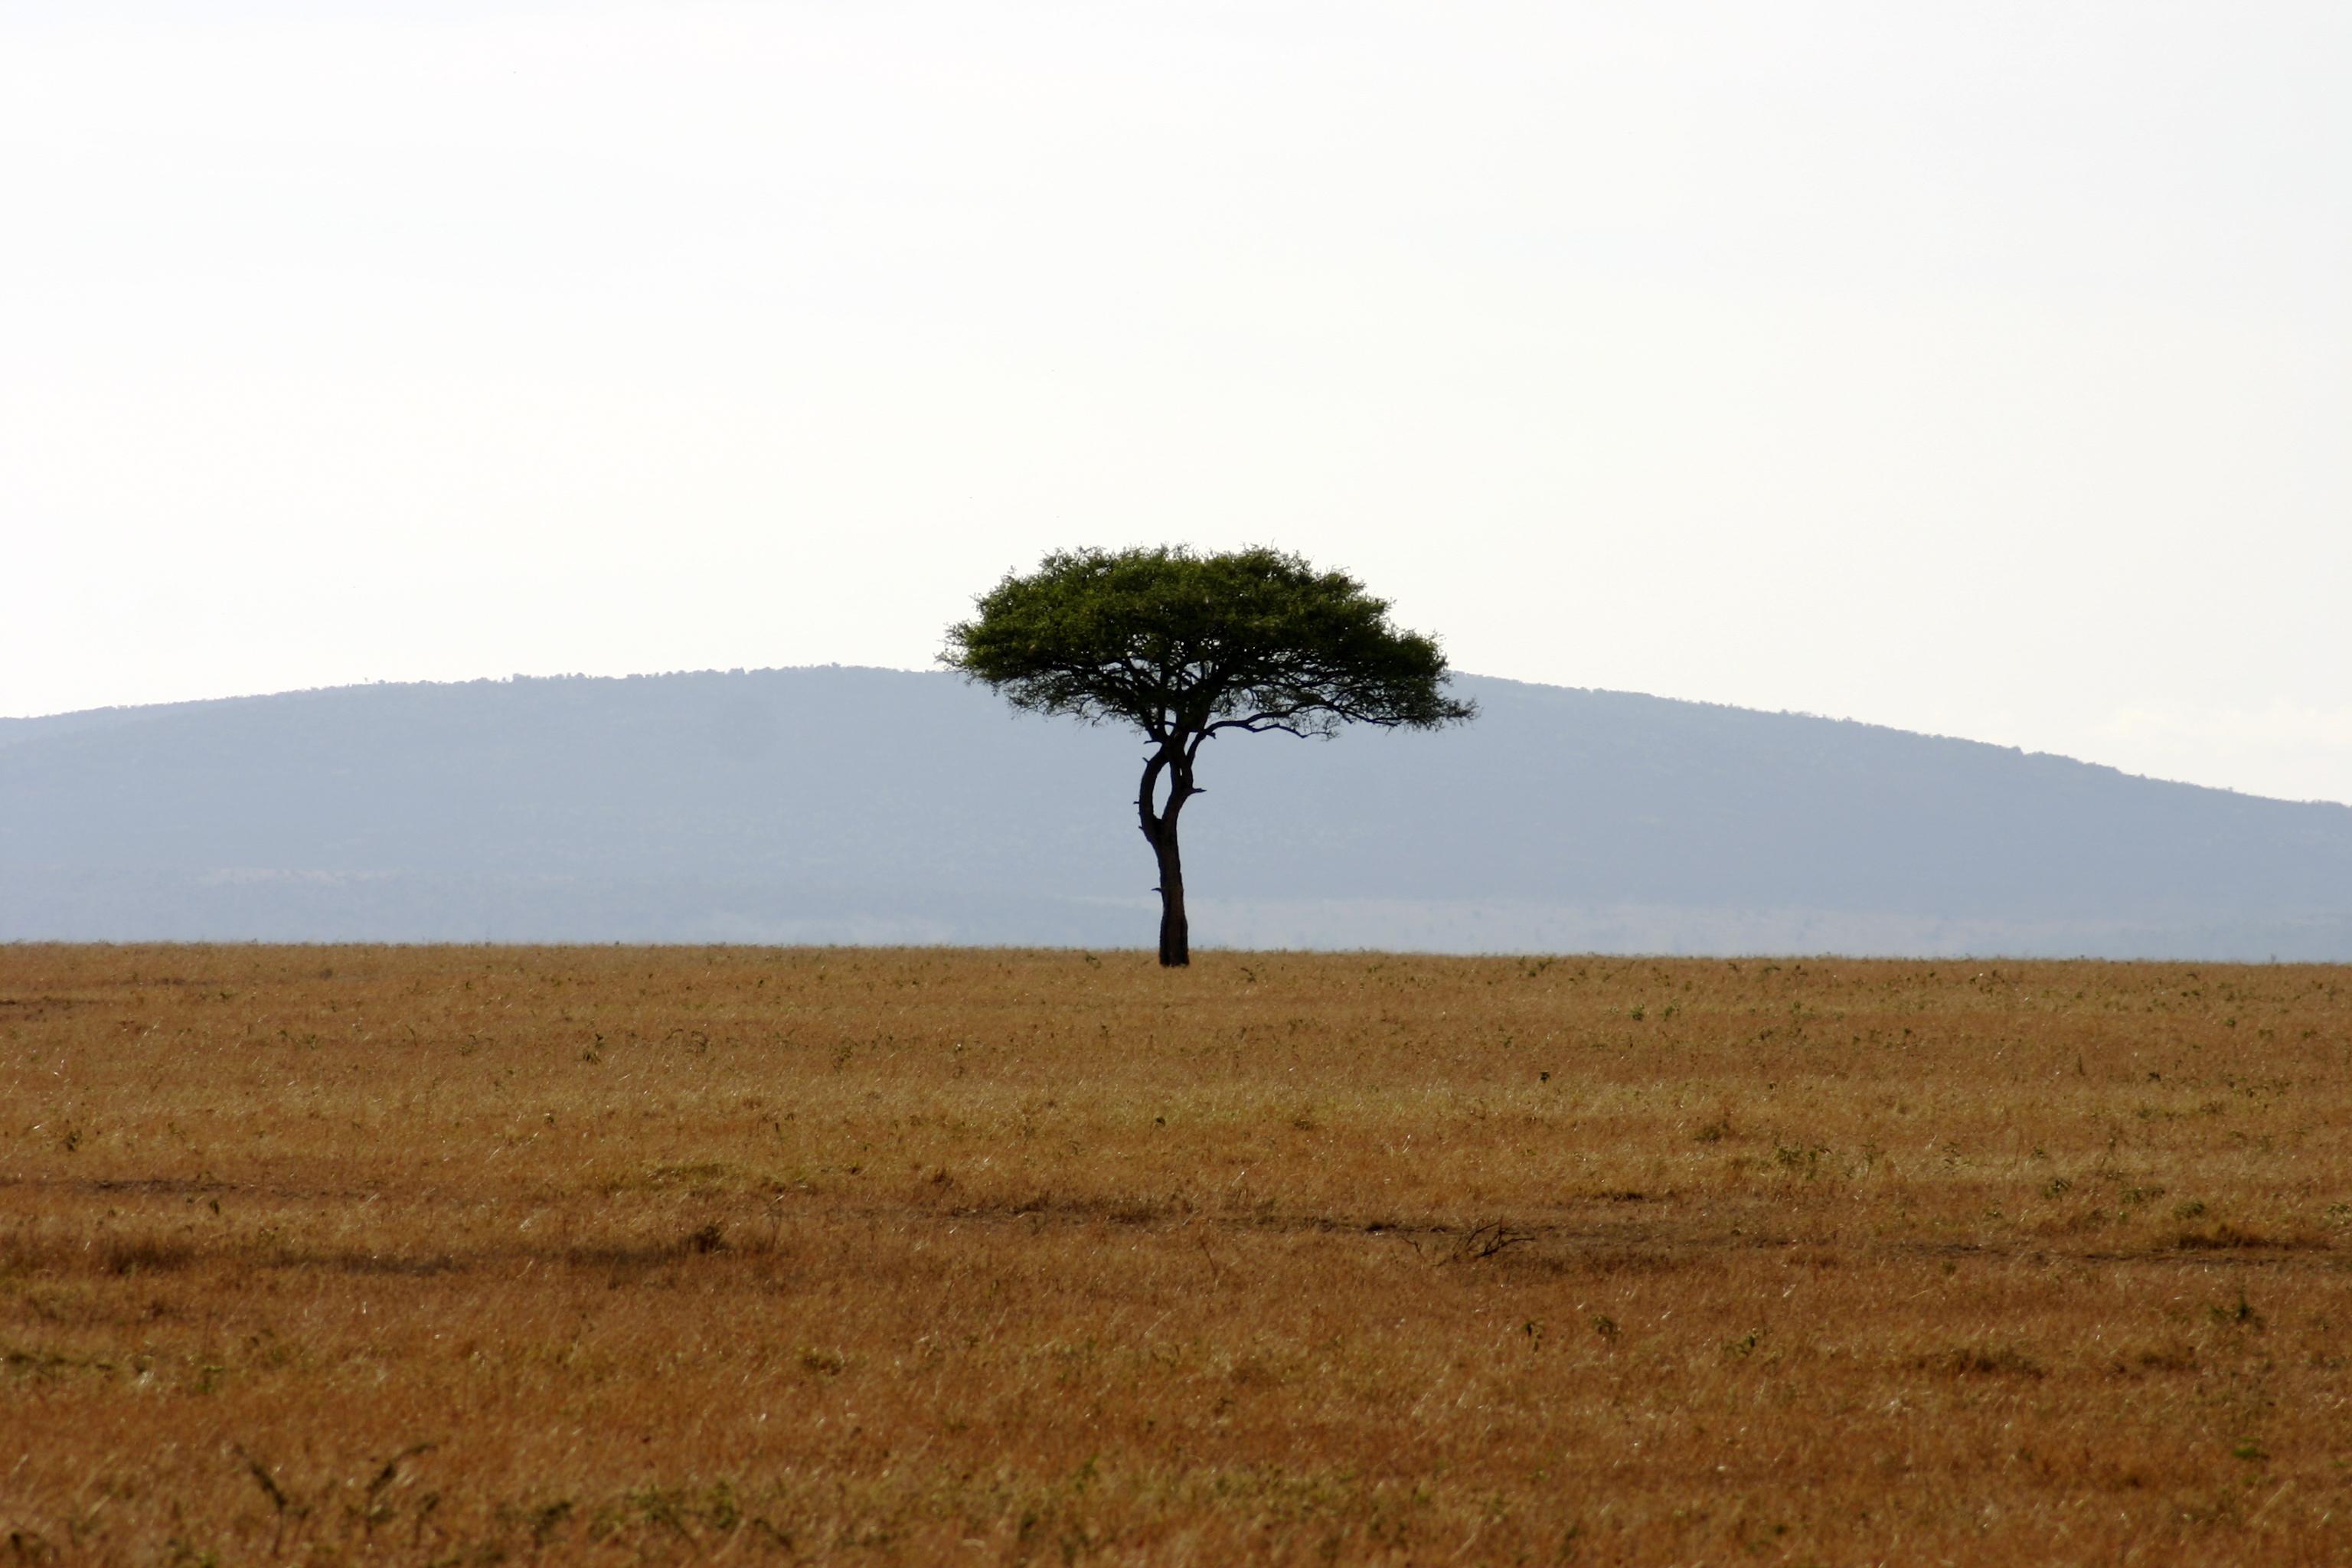 Africa Grasslands 97